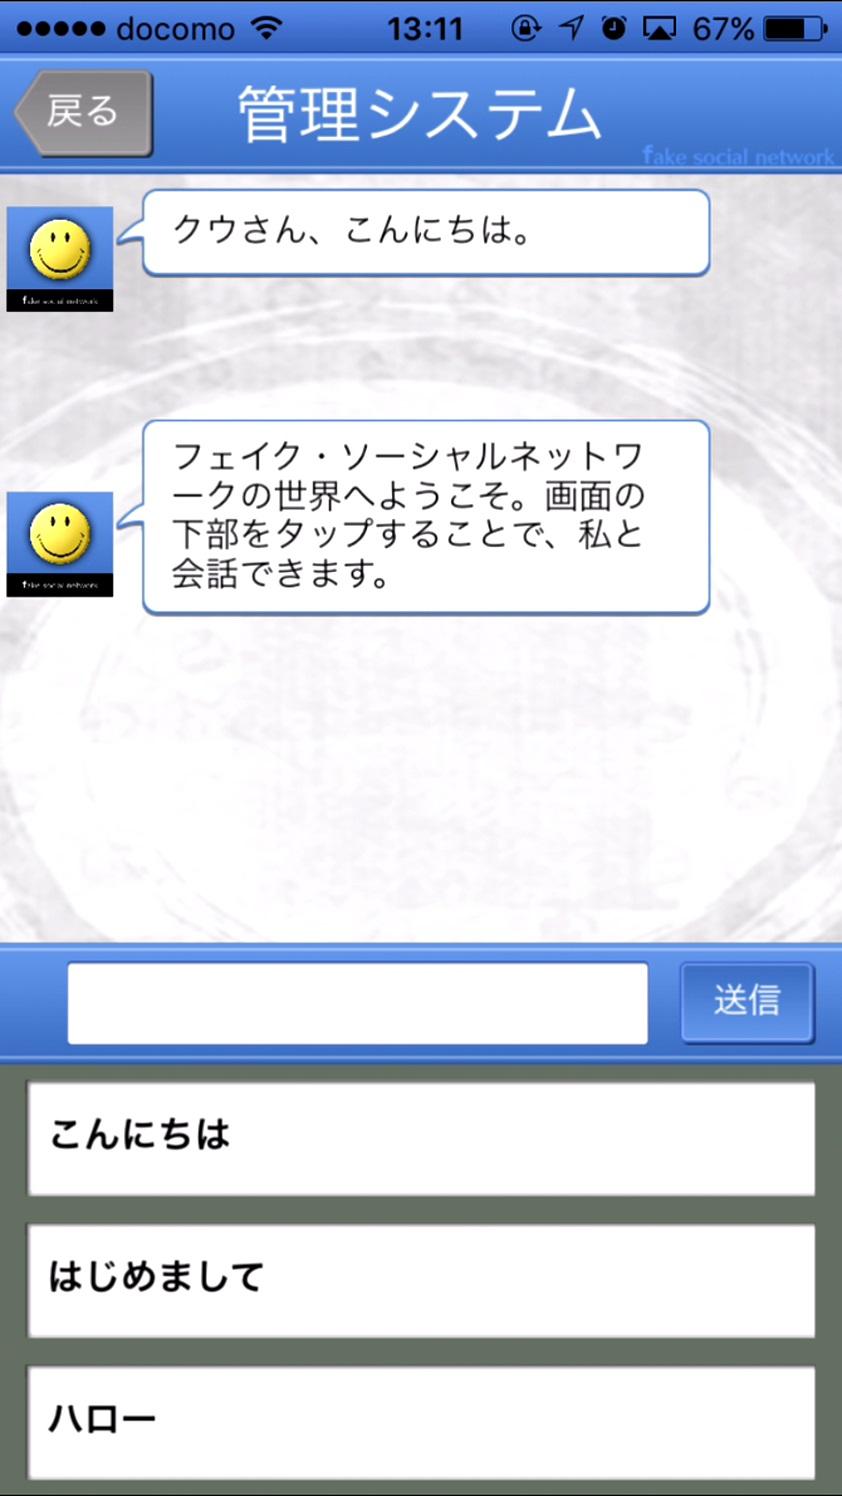 androidアプリ リアルデスゲーム - Fake Social Network -攻略スクリーンショット3